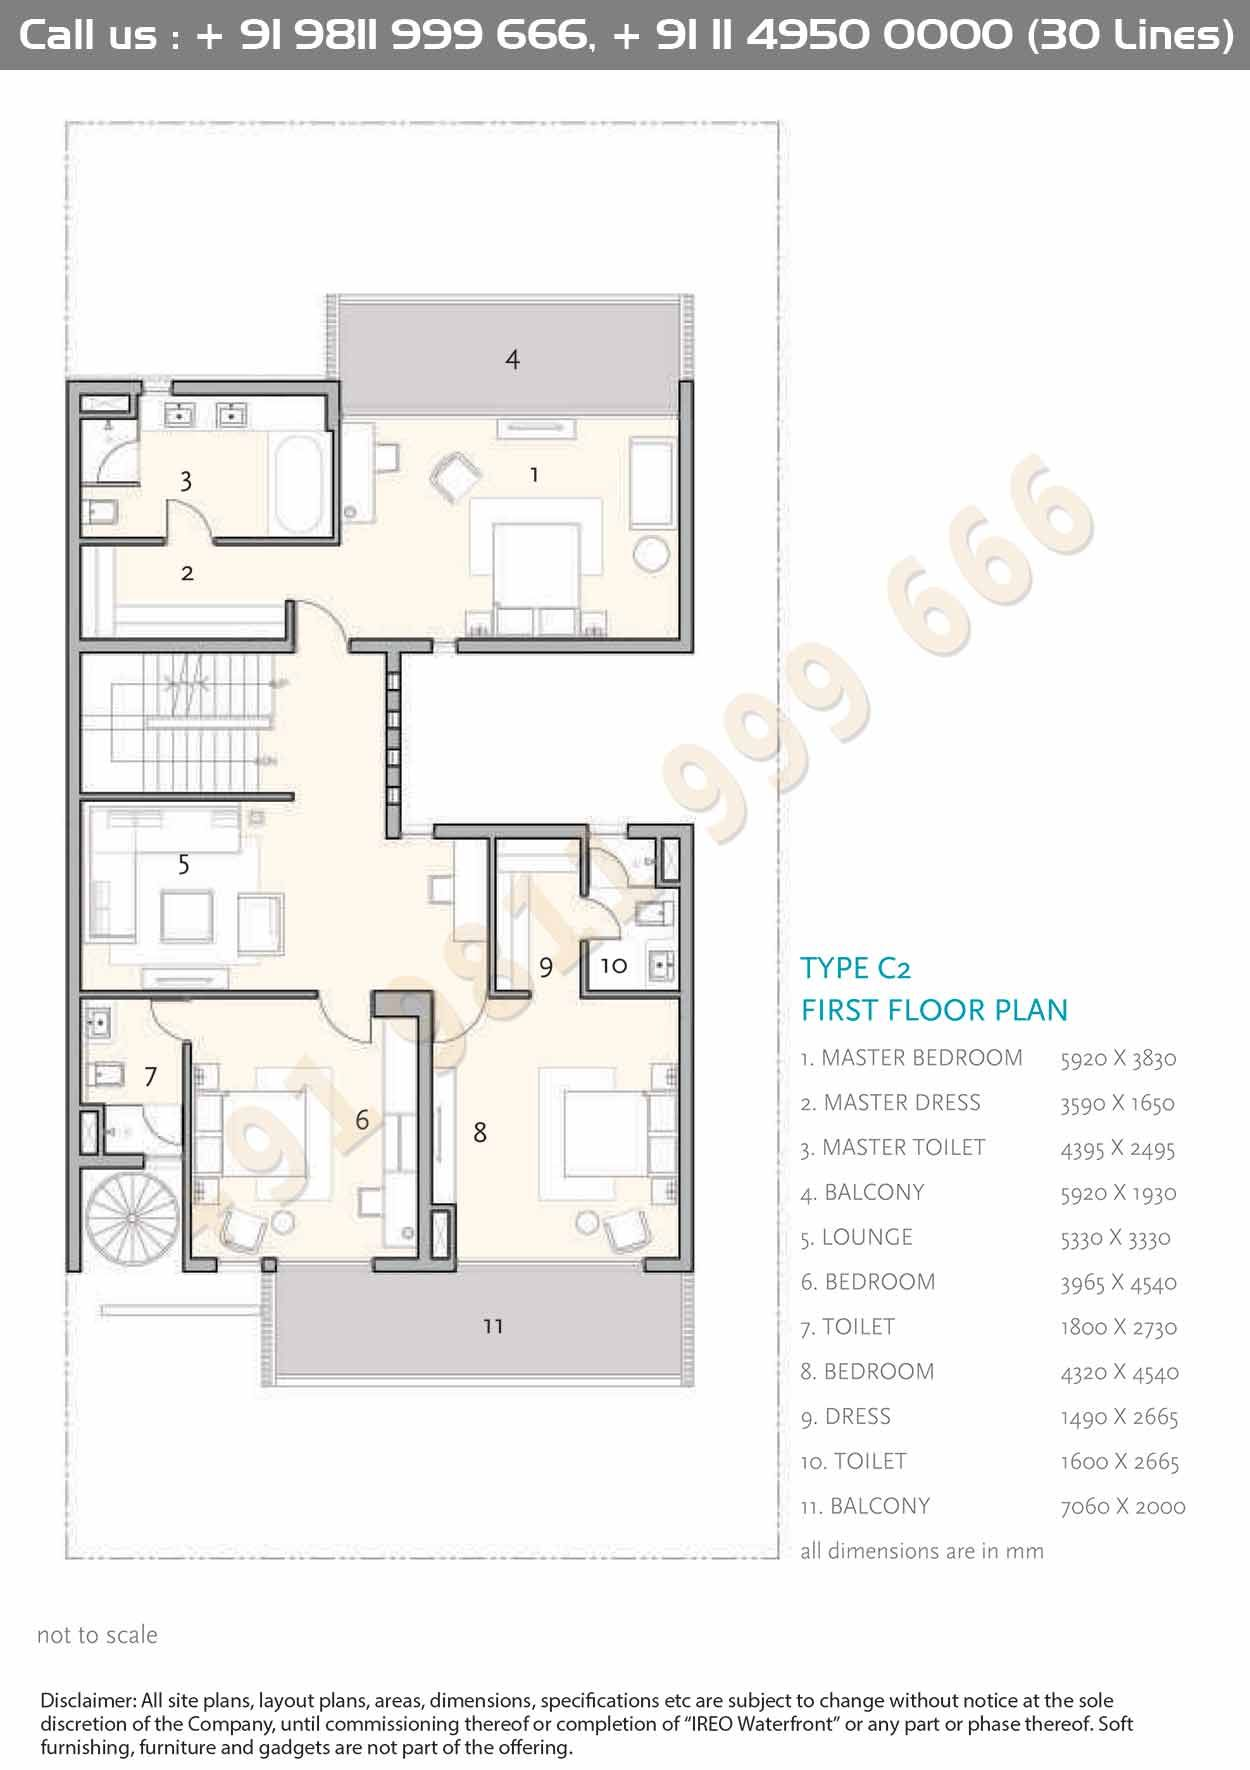 Type C2 First Floor Plan Floor Plans Architectural Floor Plans Courtyard House Plans